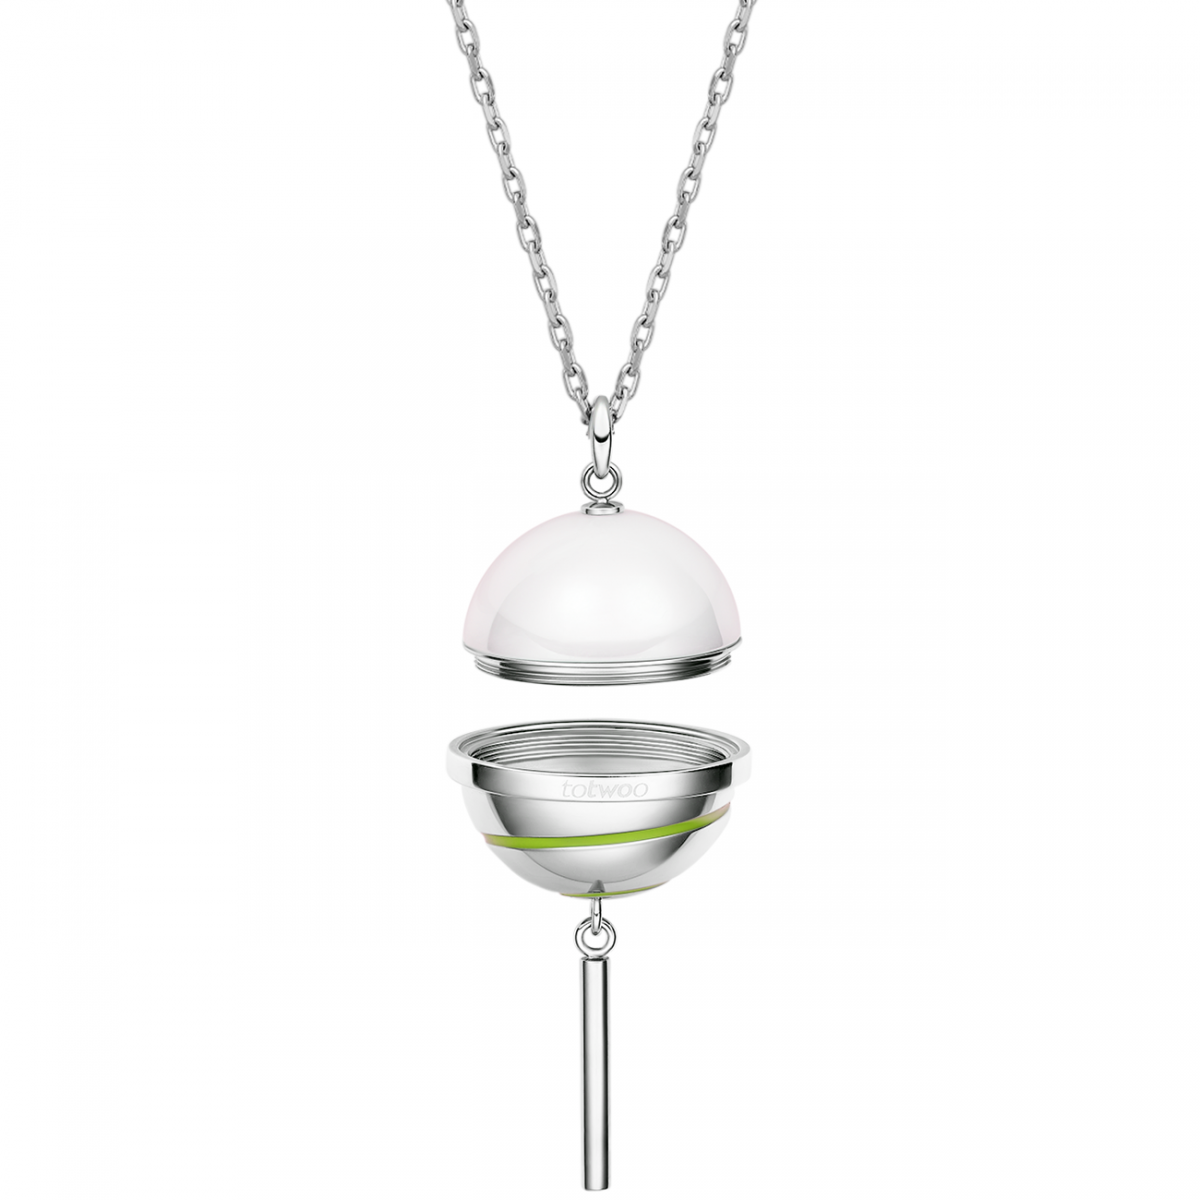 Lolli Lemonade Necklace